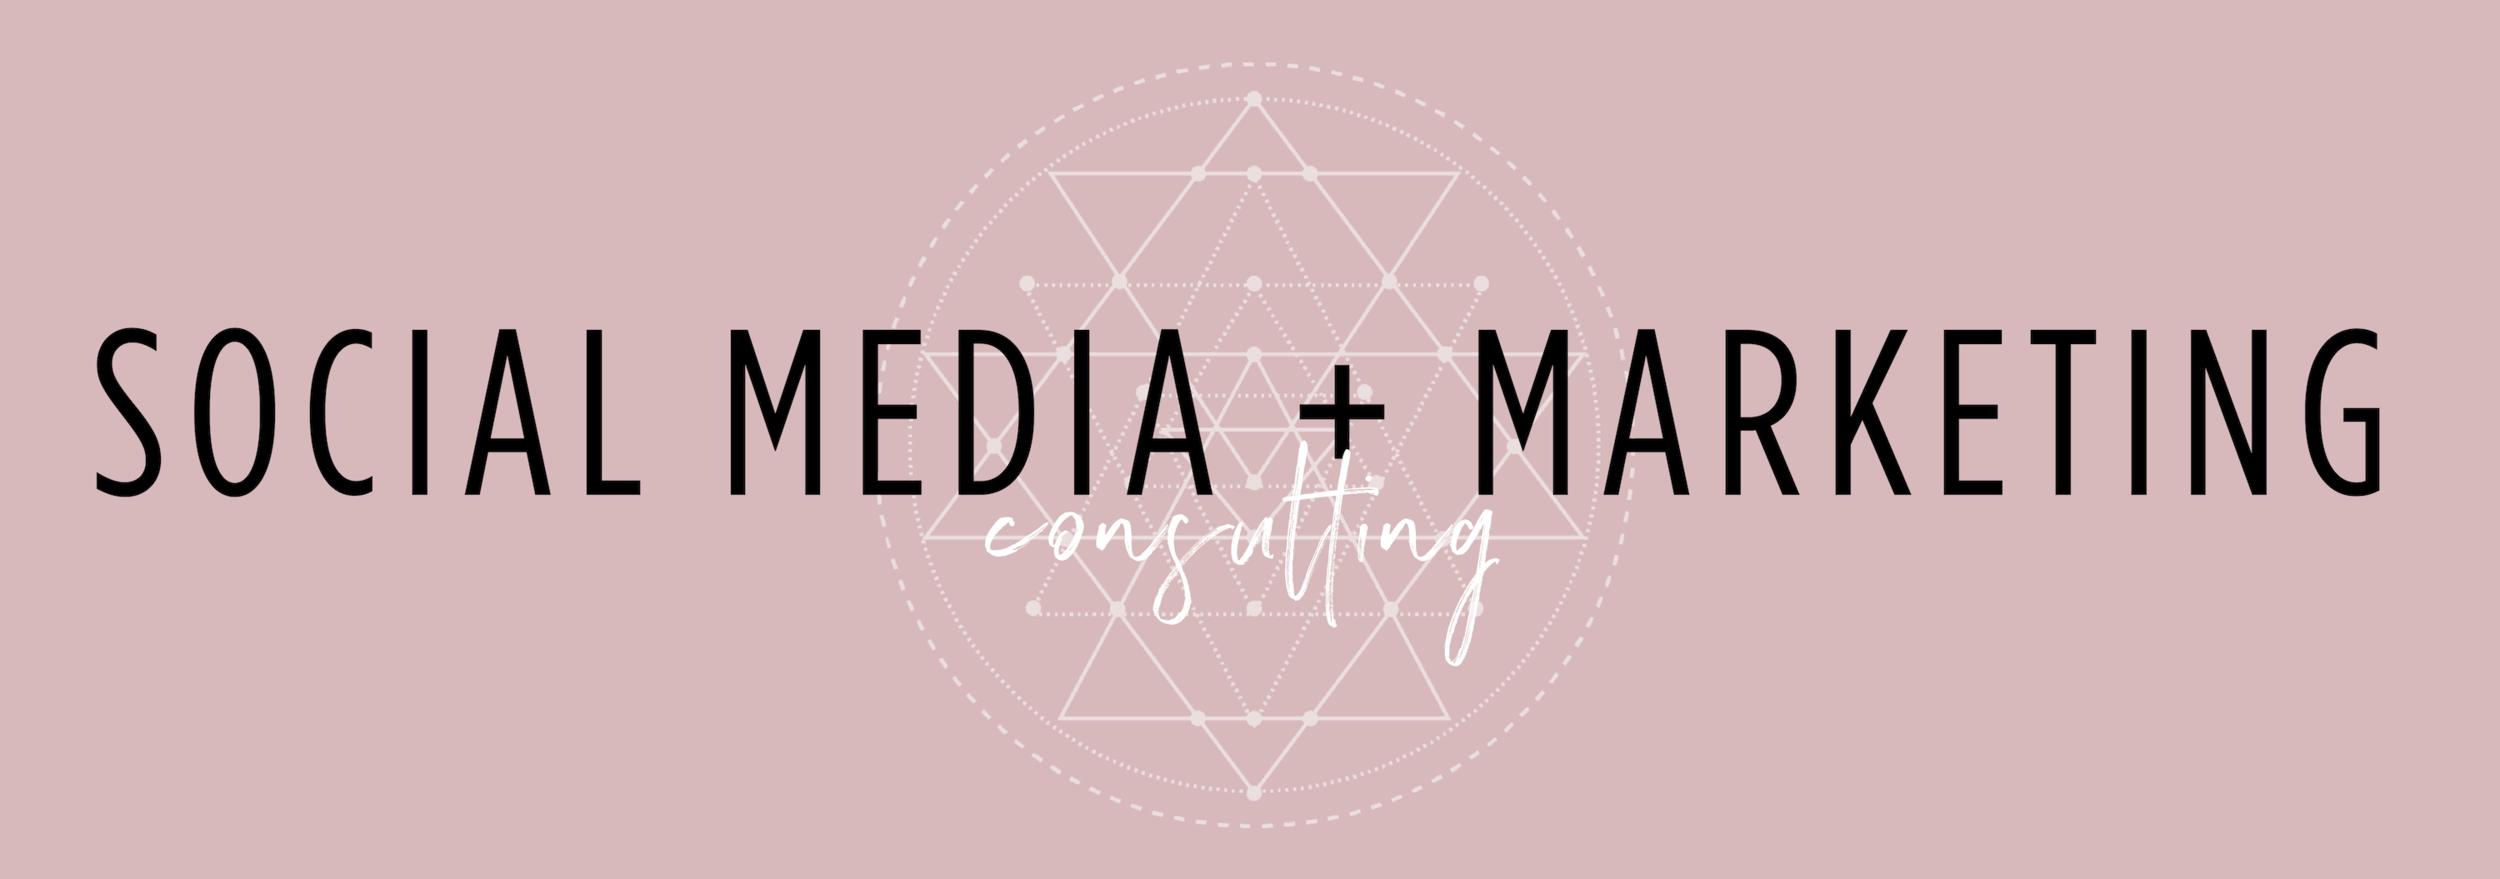 Social Media + Marketing (21).png